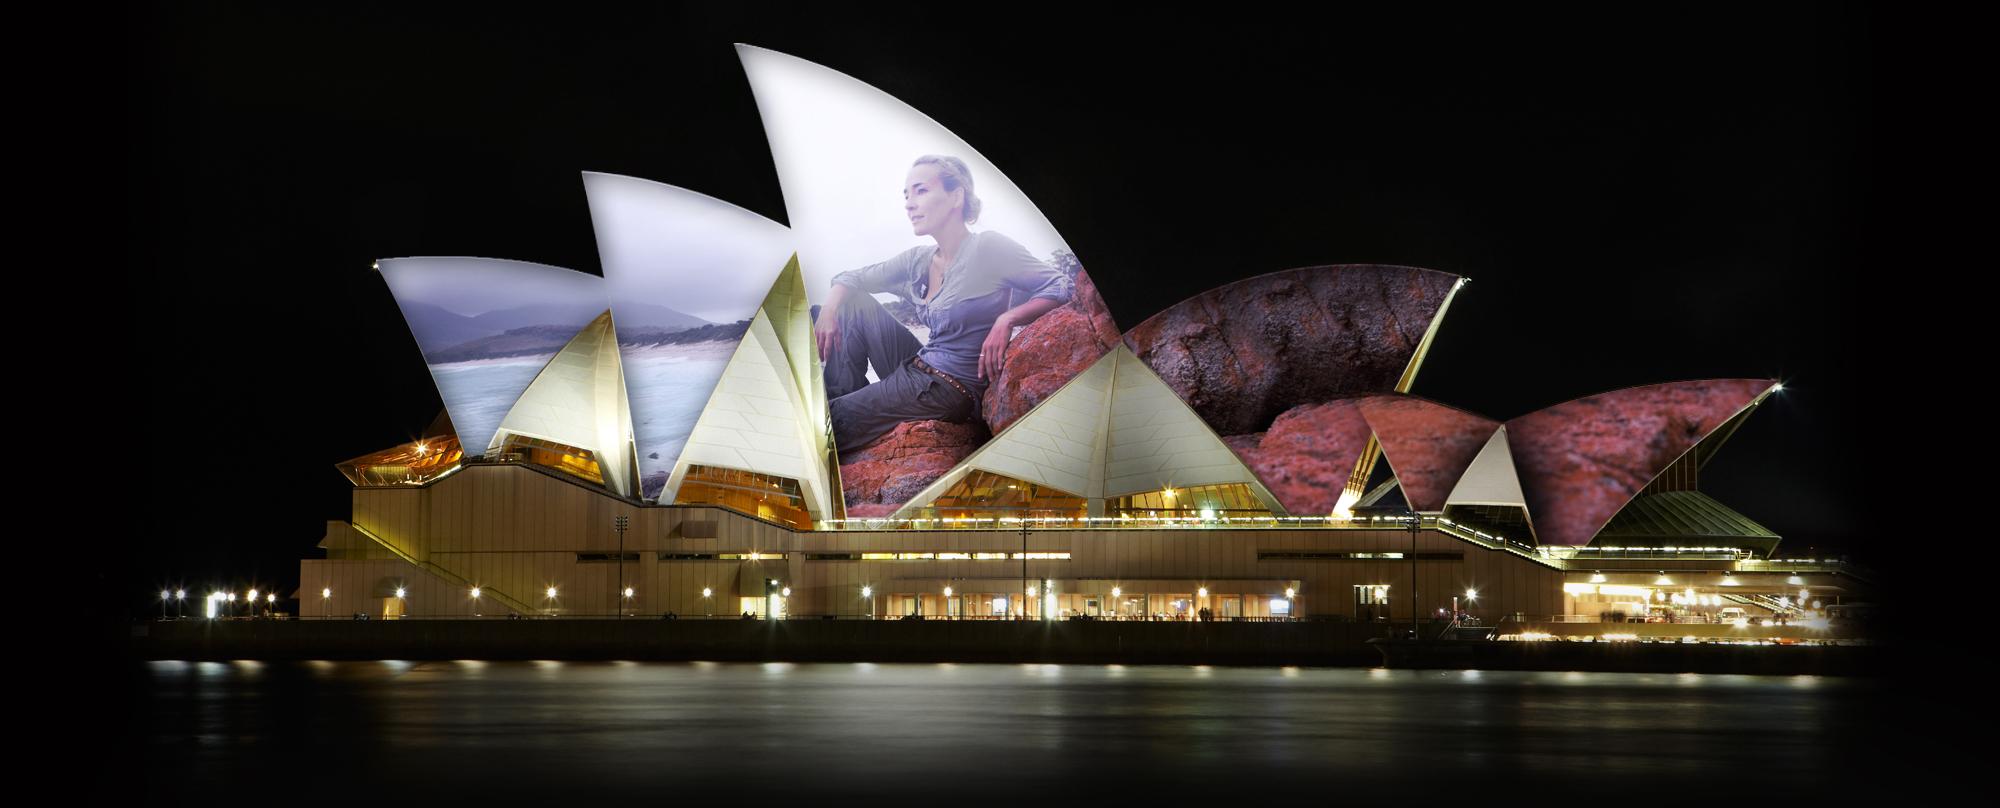 sydney opera hpuse project 2